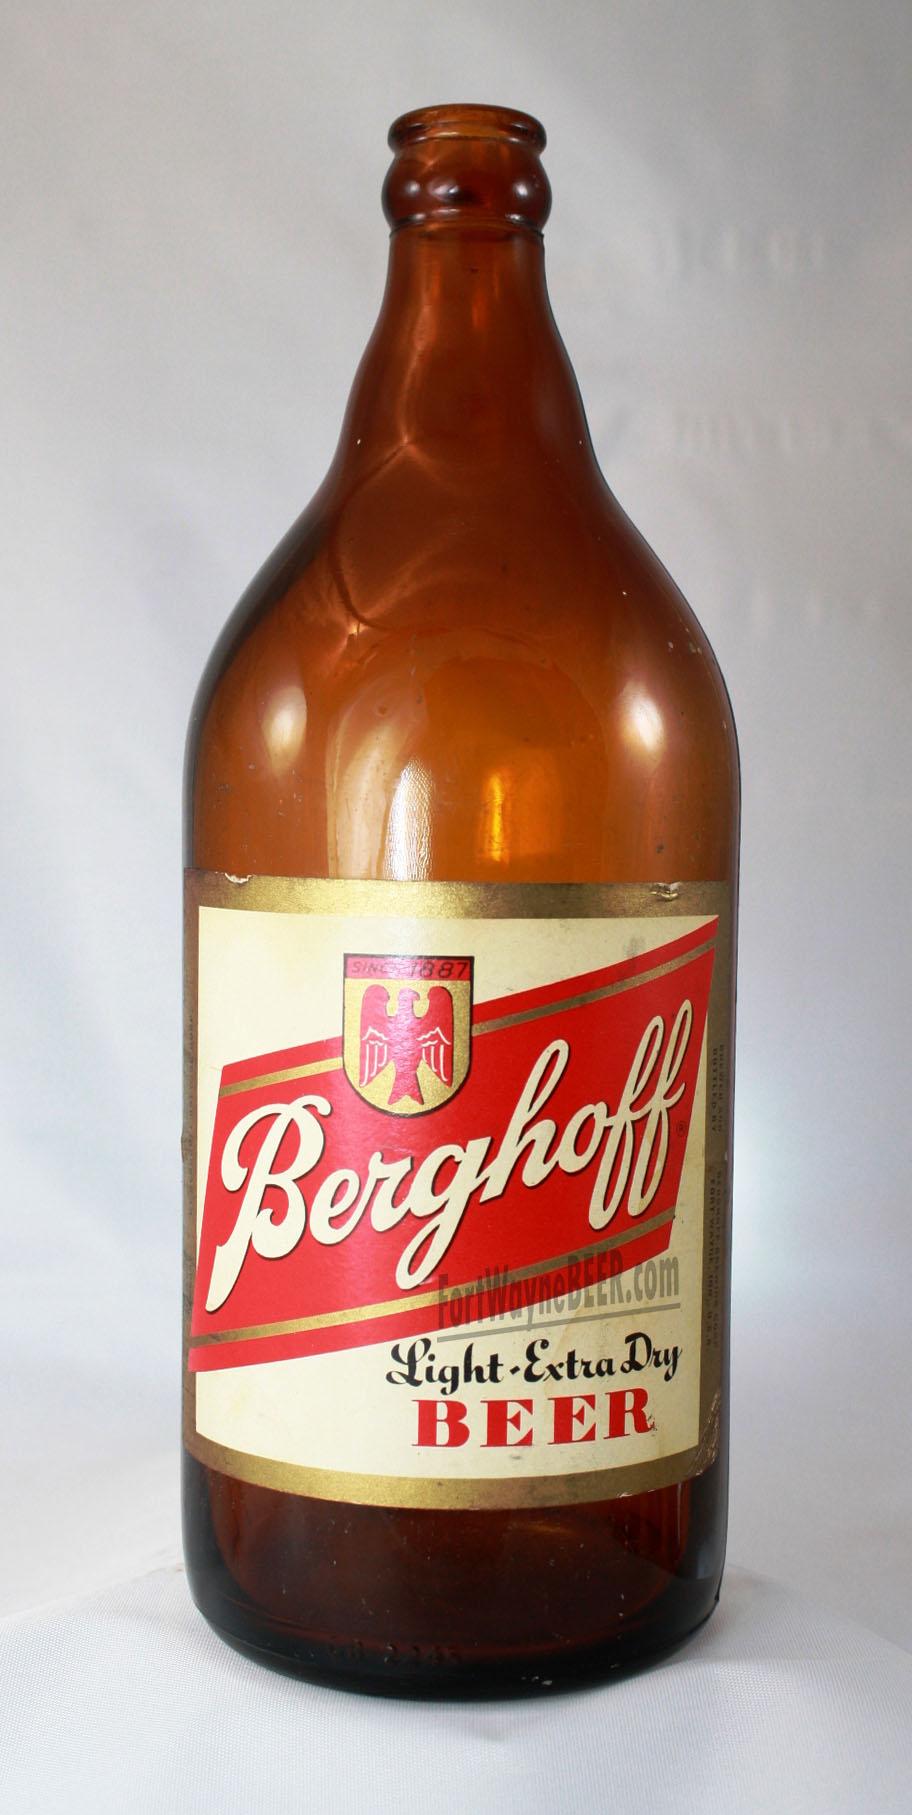 Berghoff light dry bottle1 psd copy.jpg